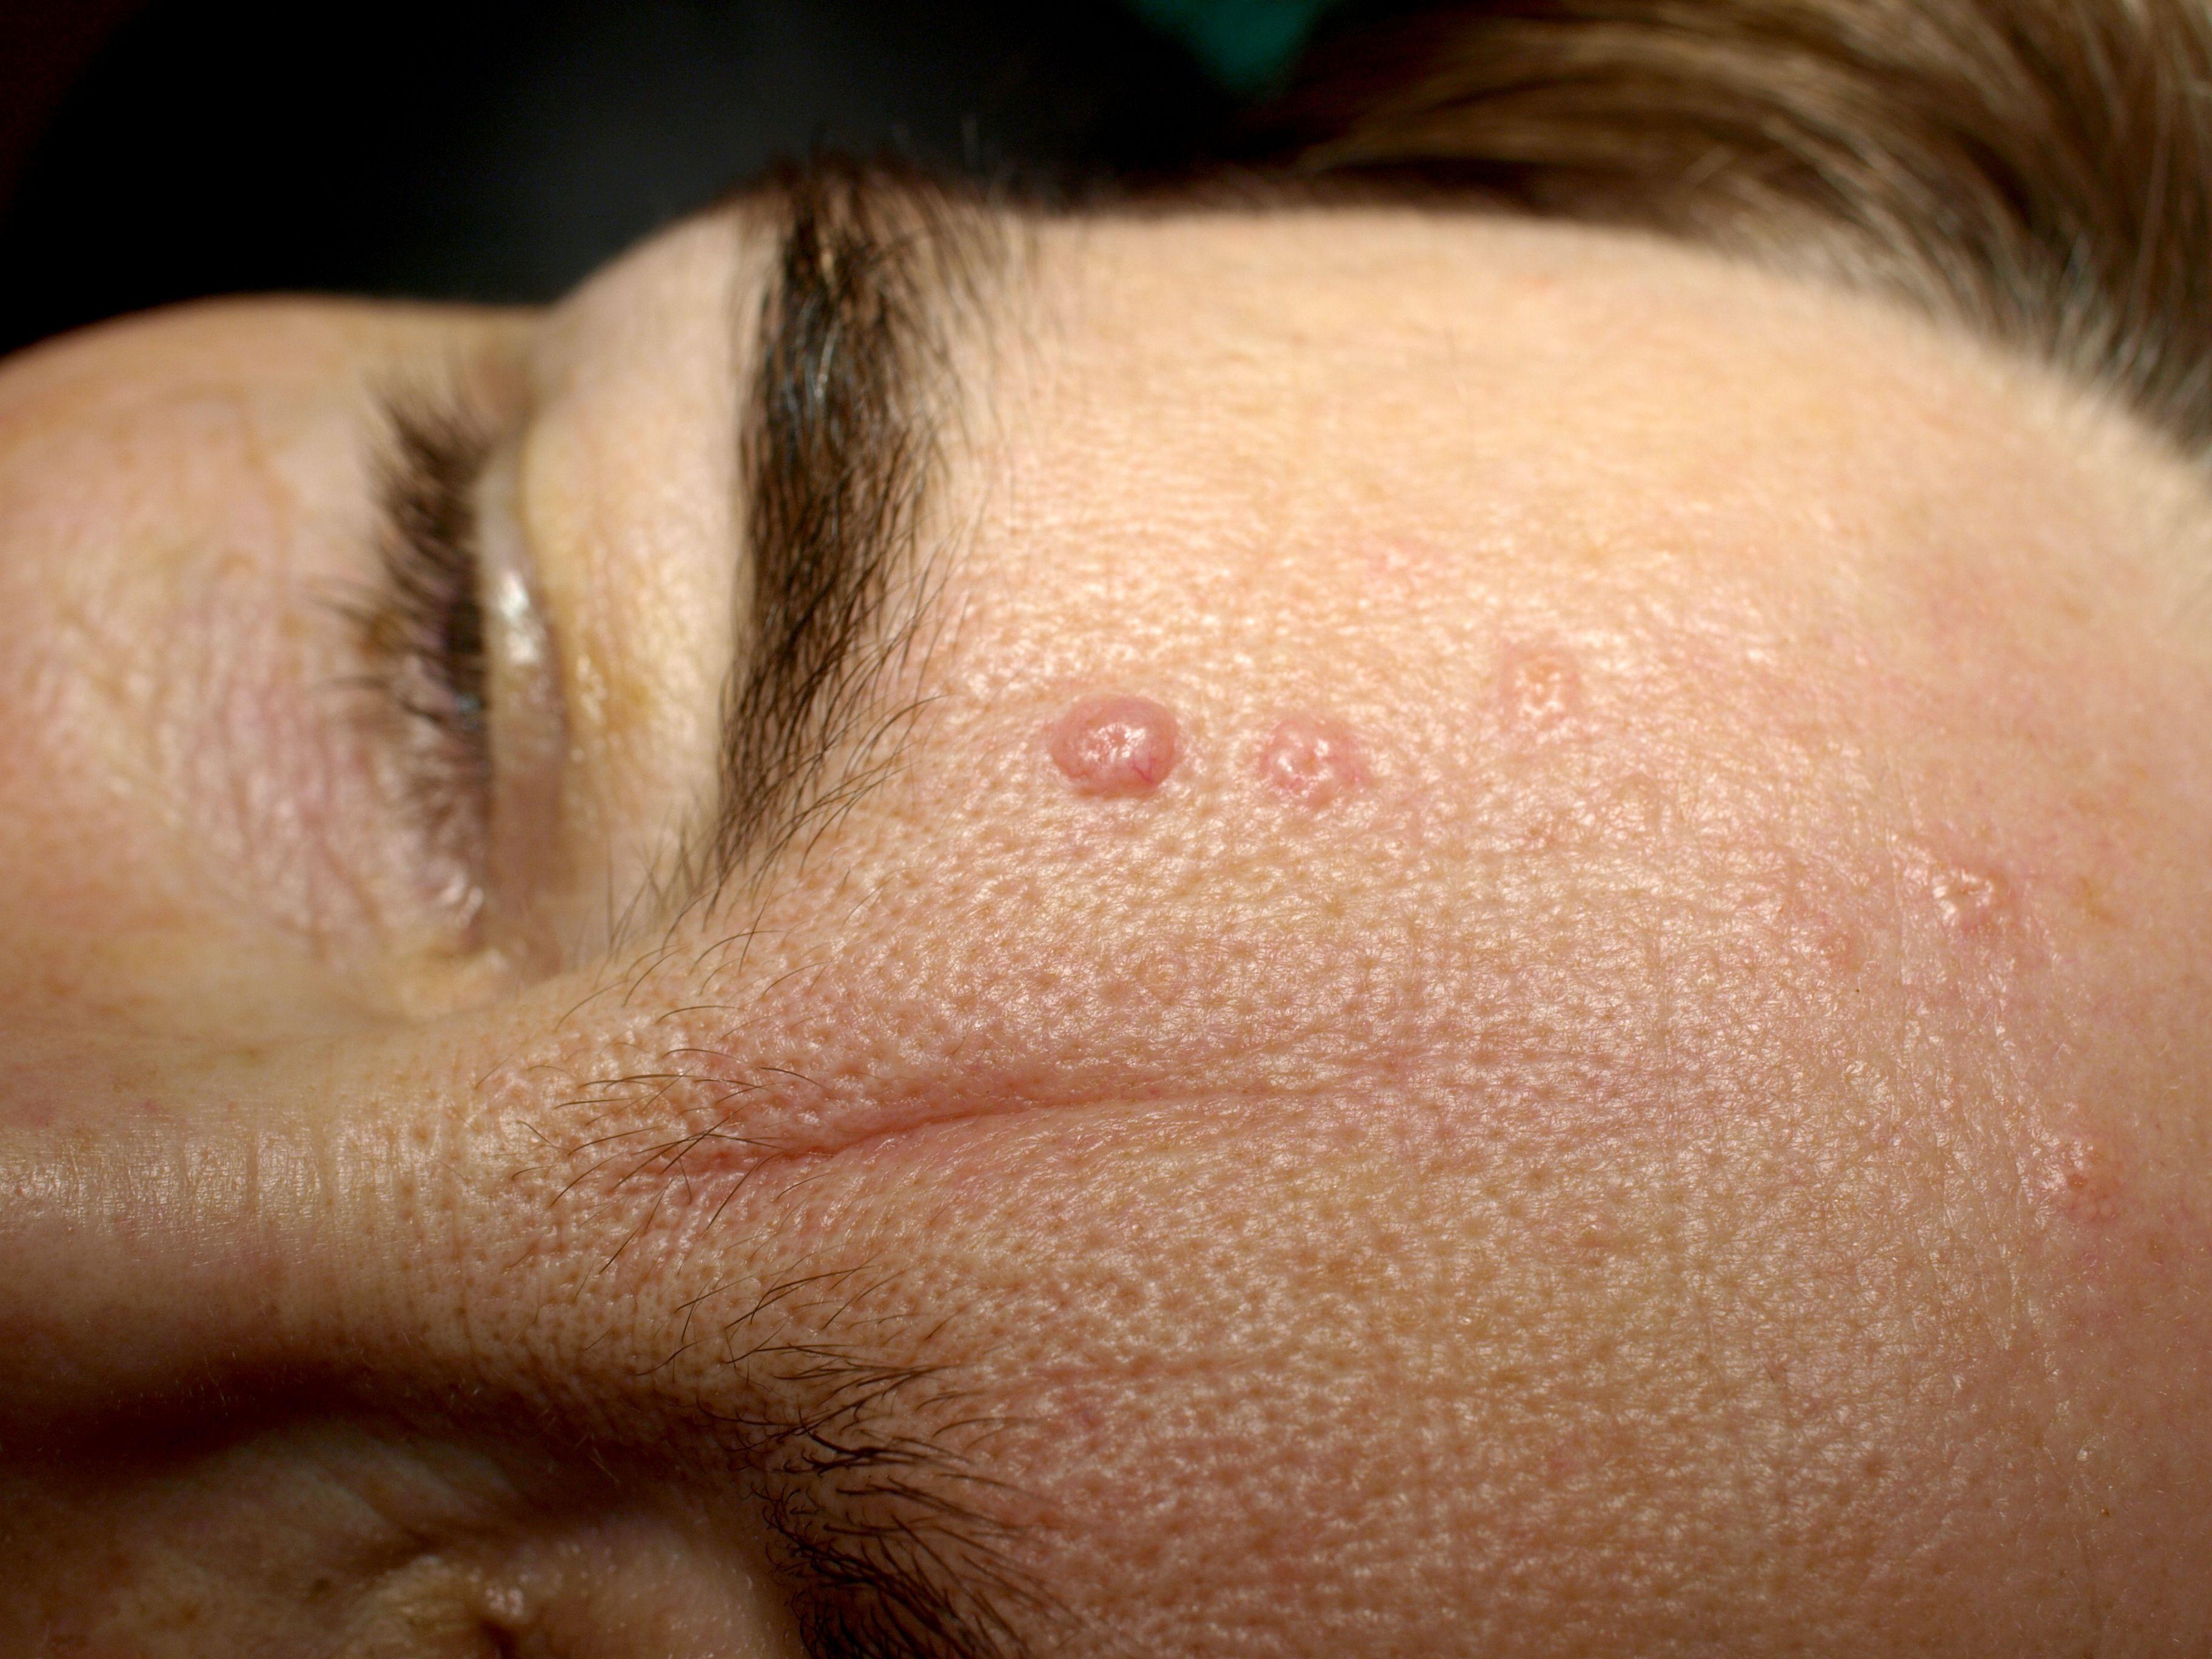 papilloma wart on scalp recurrent respiratory papillomatosis and bevacizumab treatment